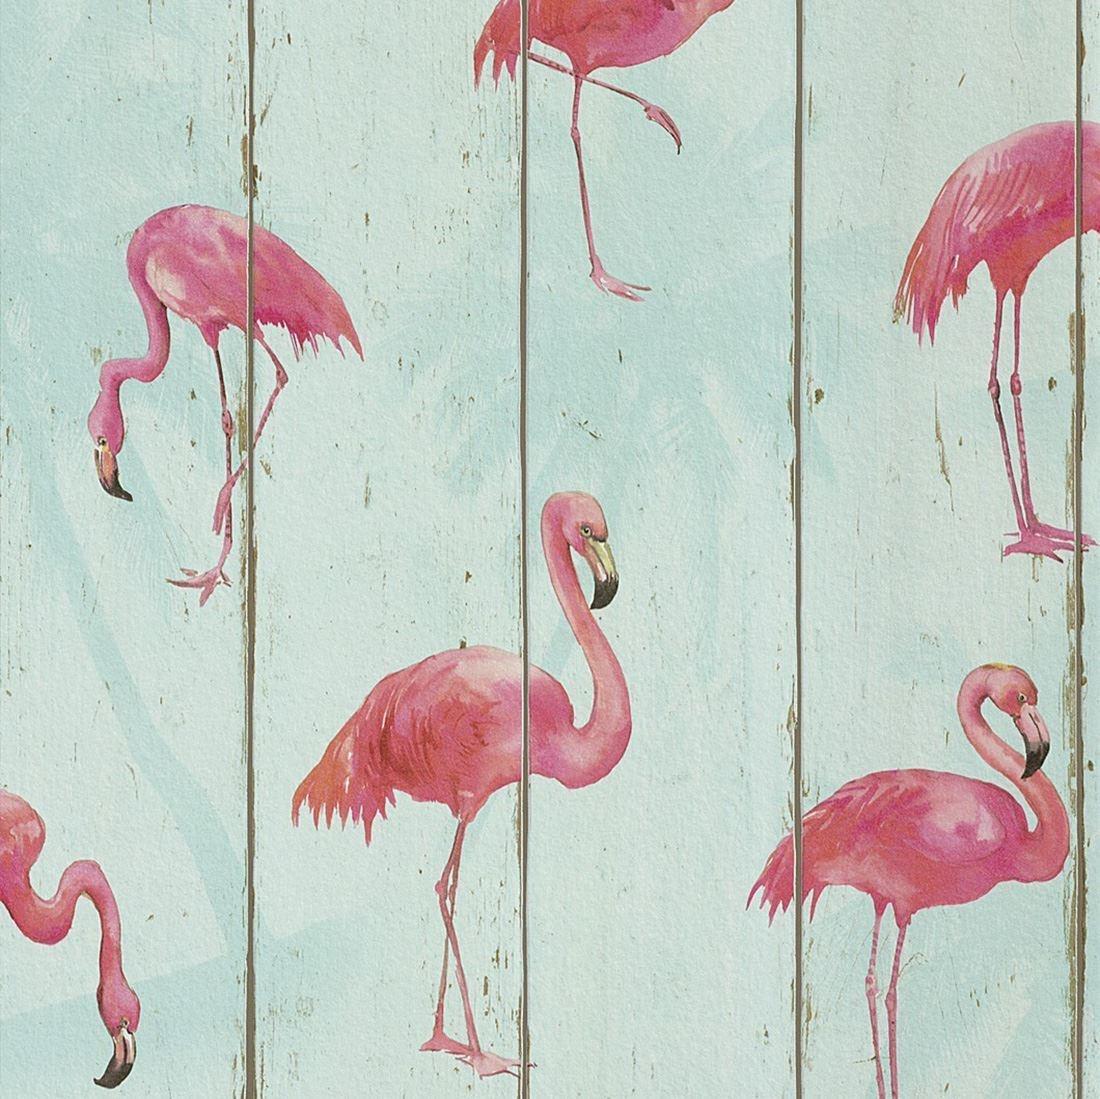 Rasch Barbara Becker Flamingo Wallpaper Teal 479706 Wood Room Decor By Uk Online For Homeware In New Zealand